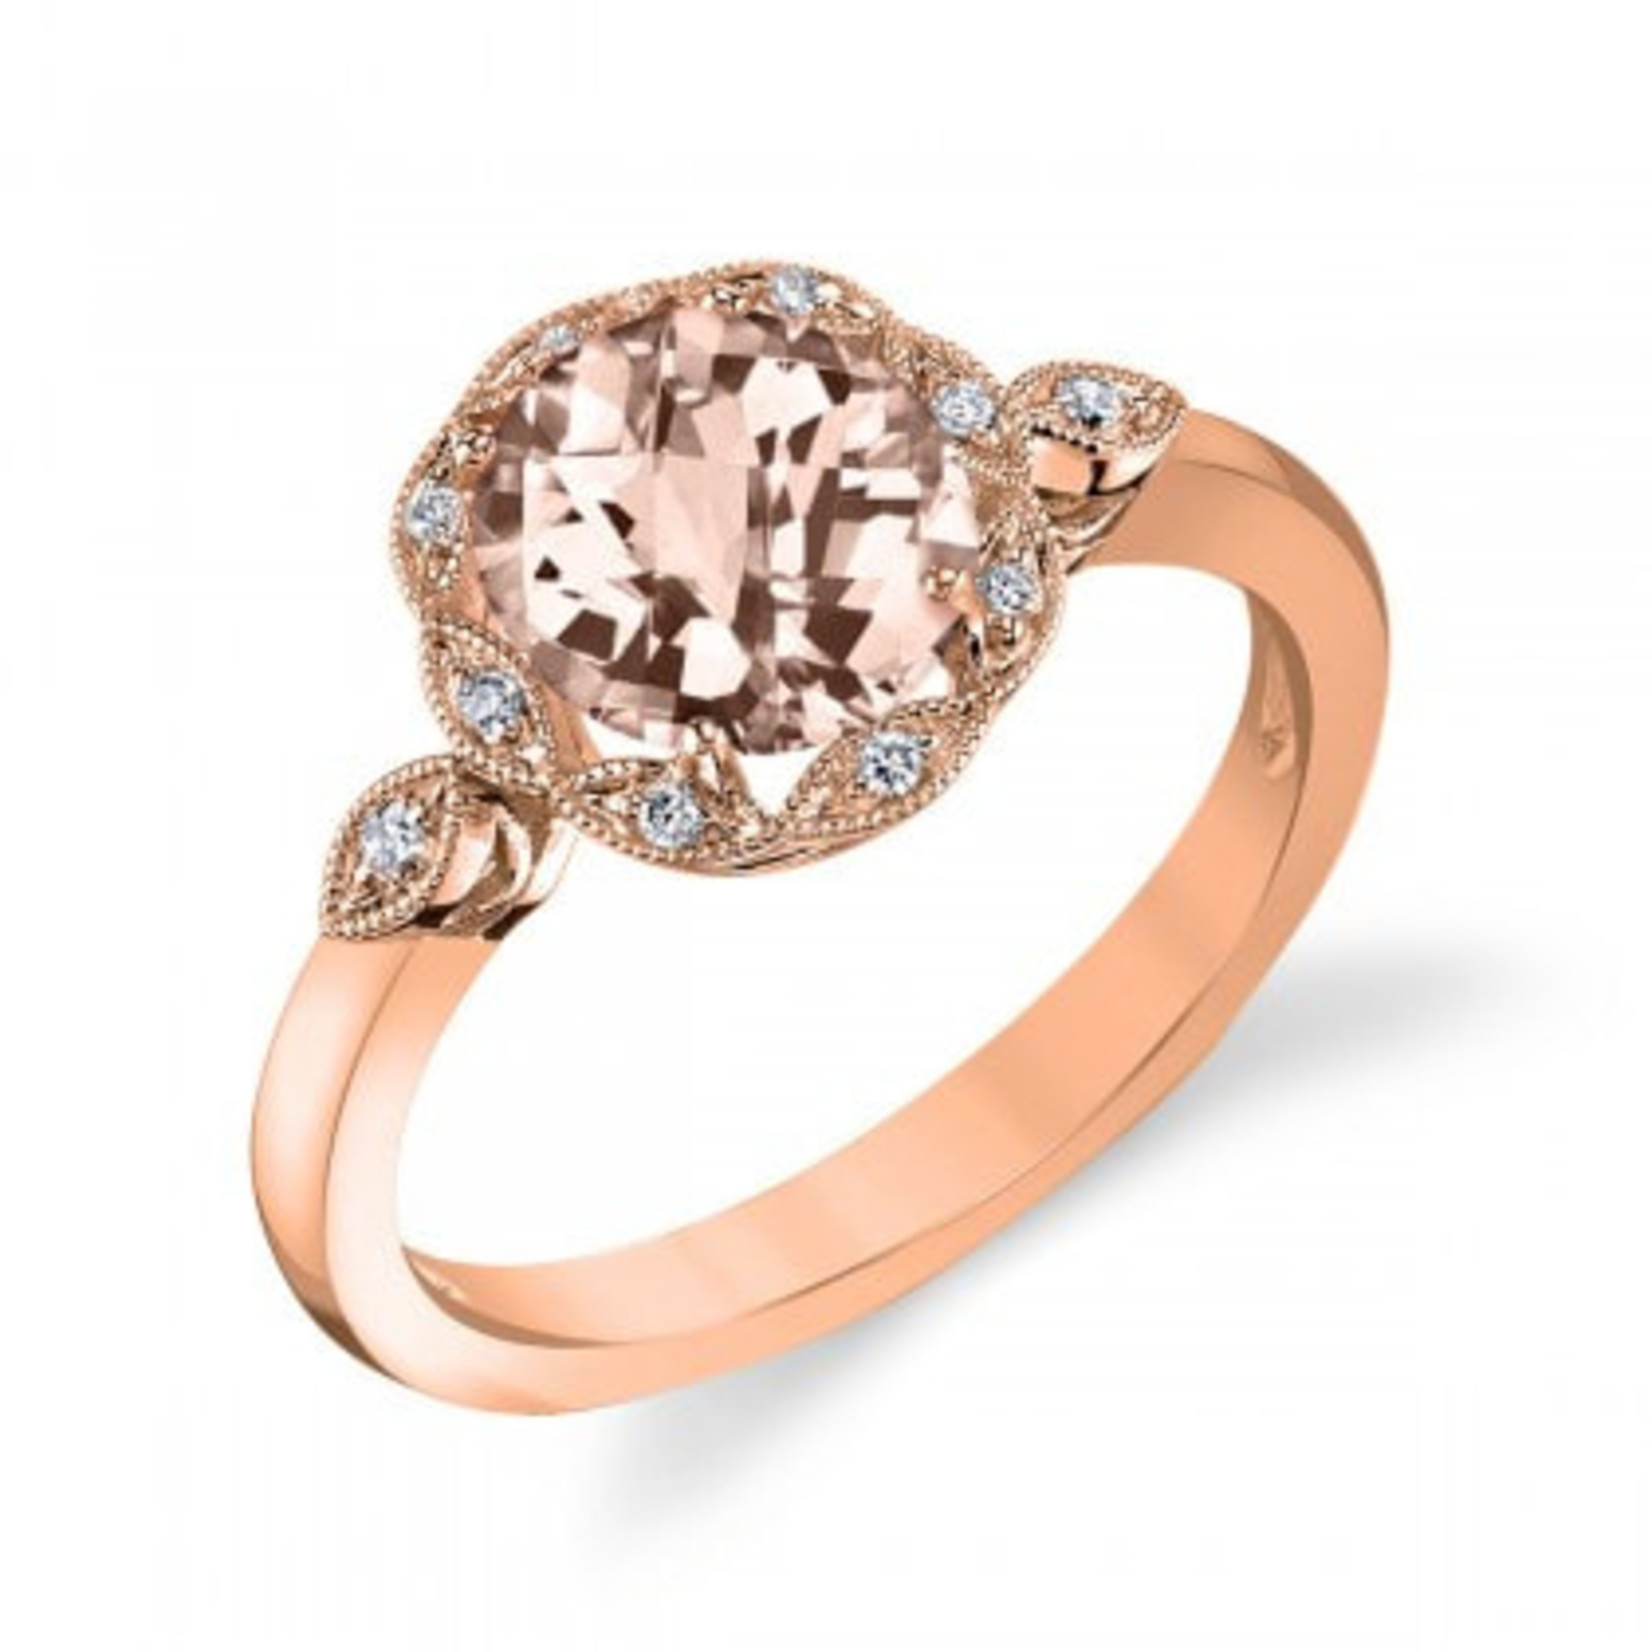 Rose Gold Oval Morganite Ring